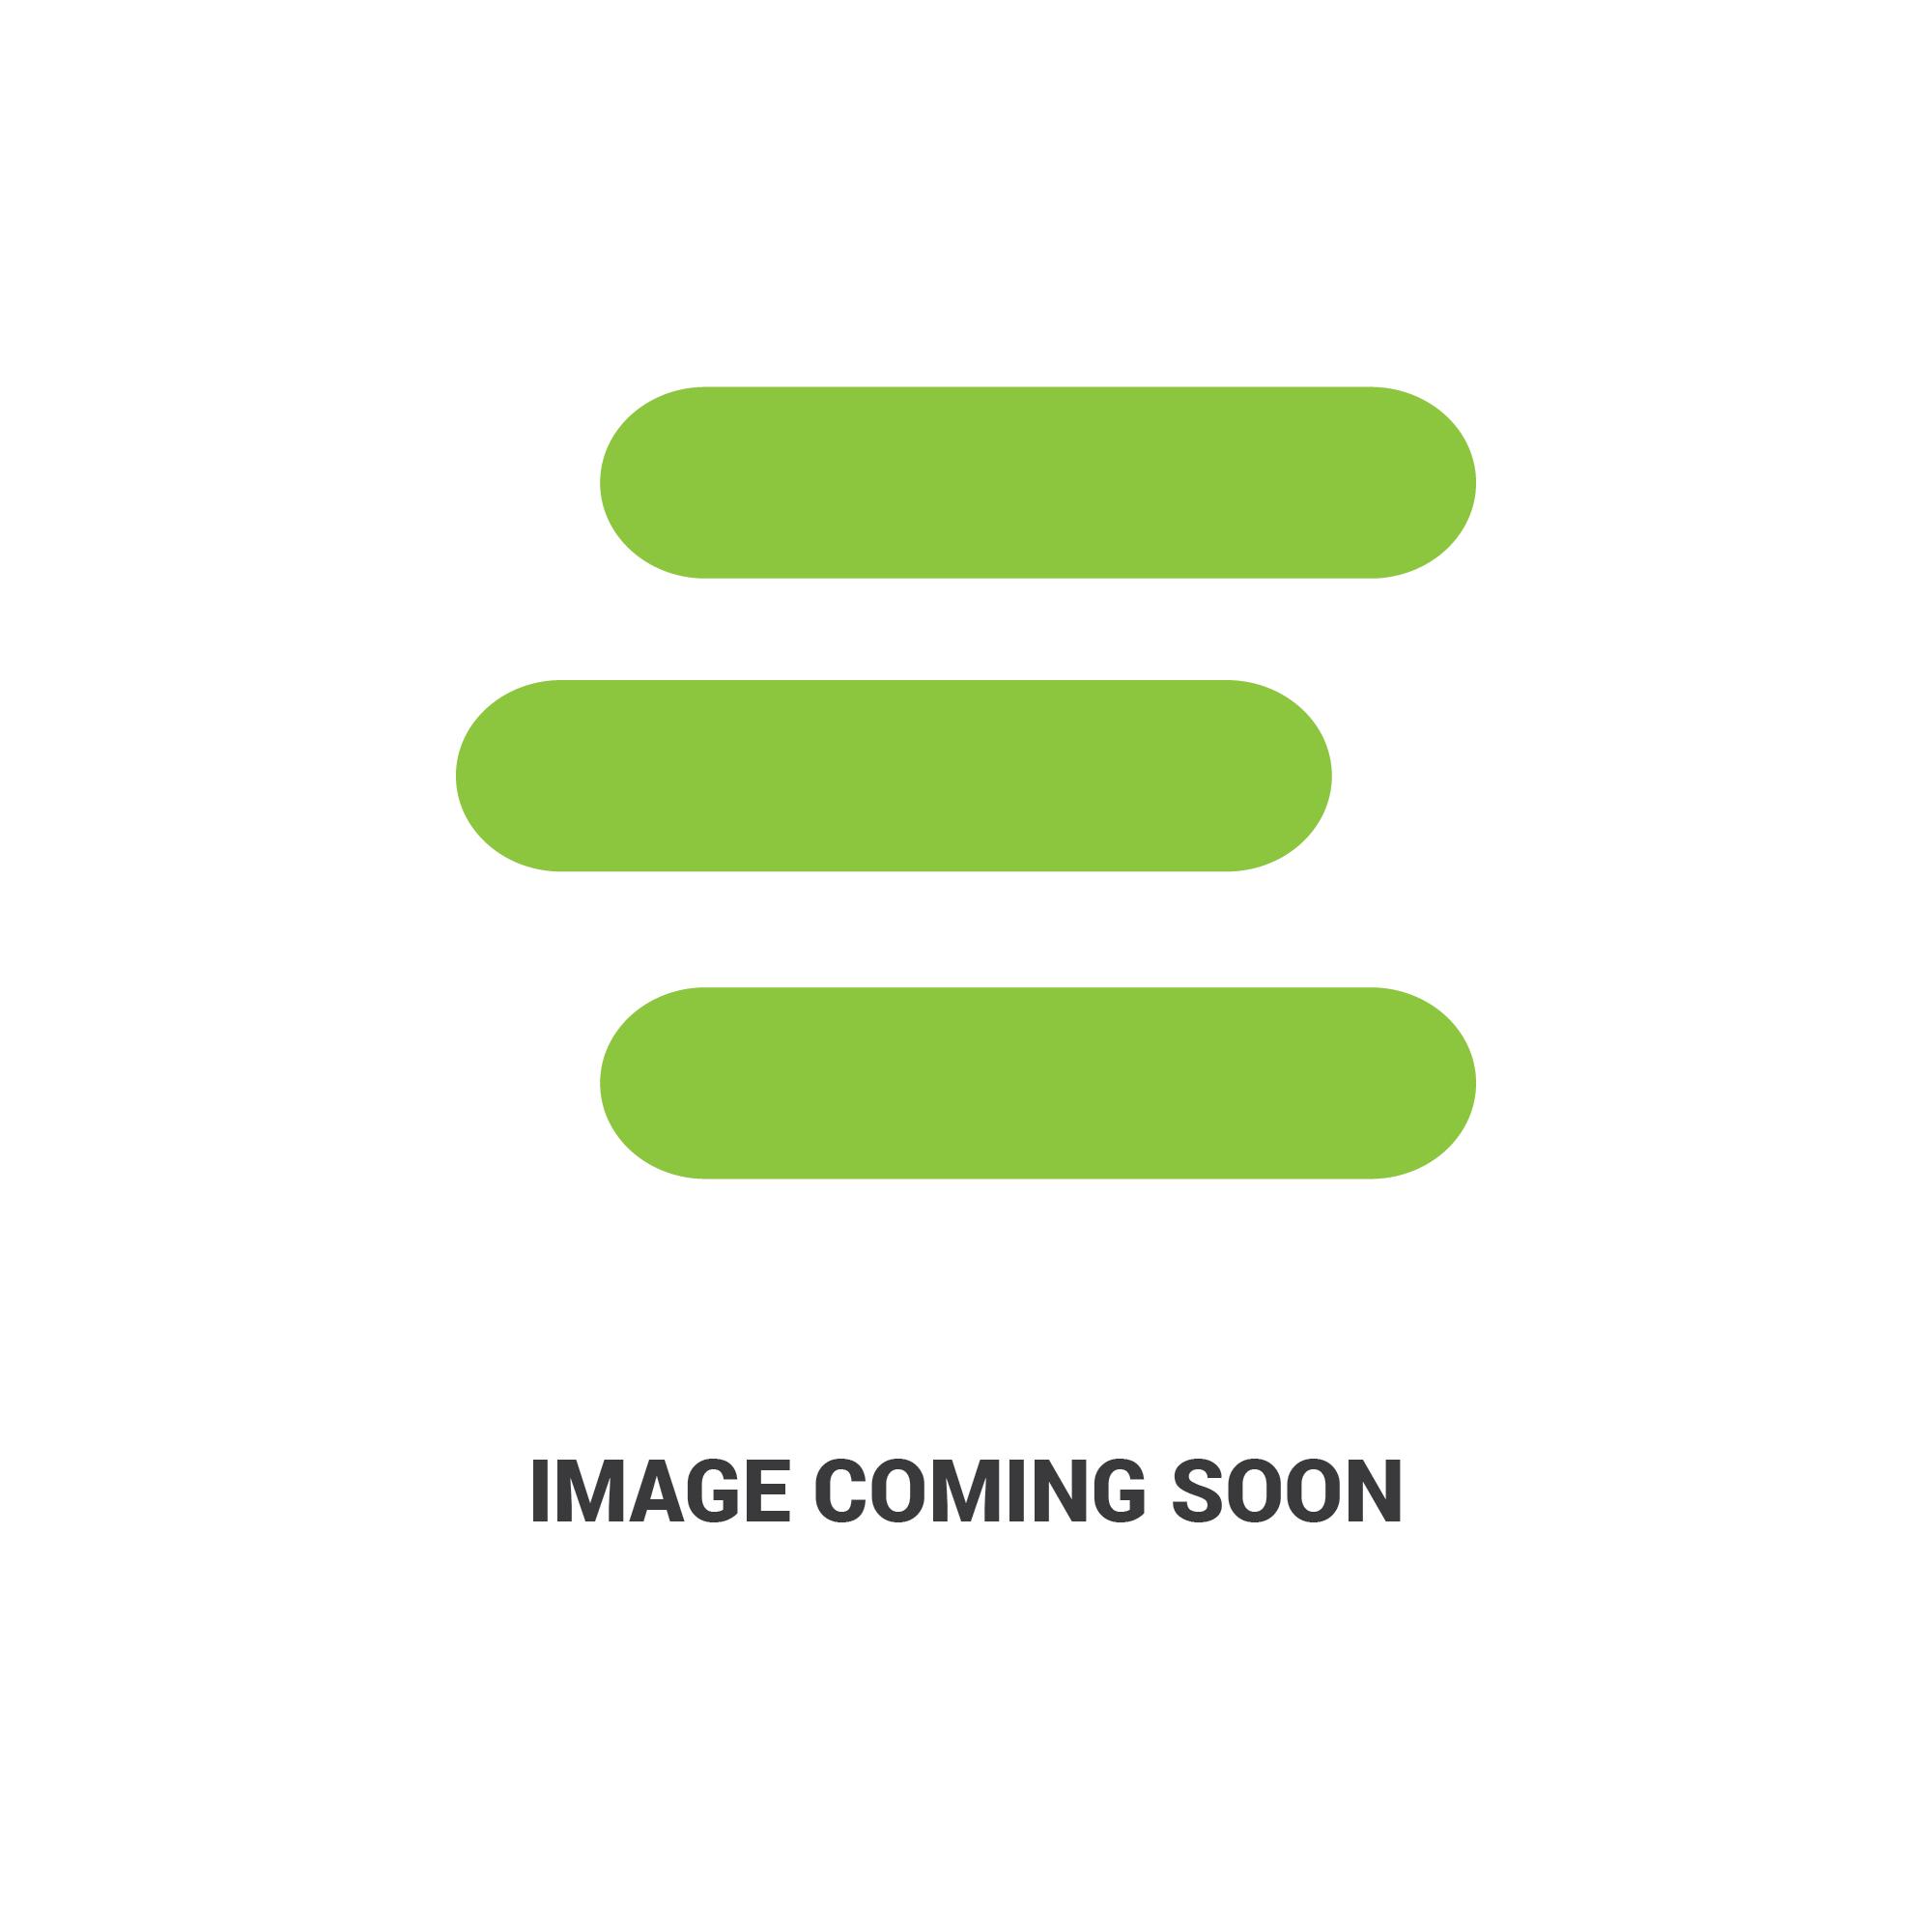 E-70255401887_4.jpg